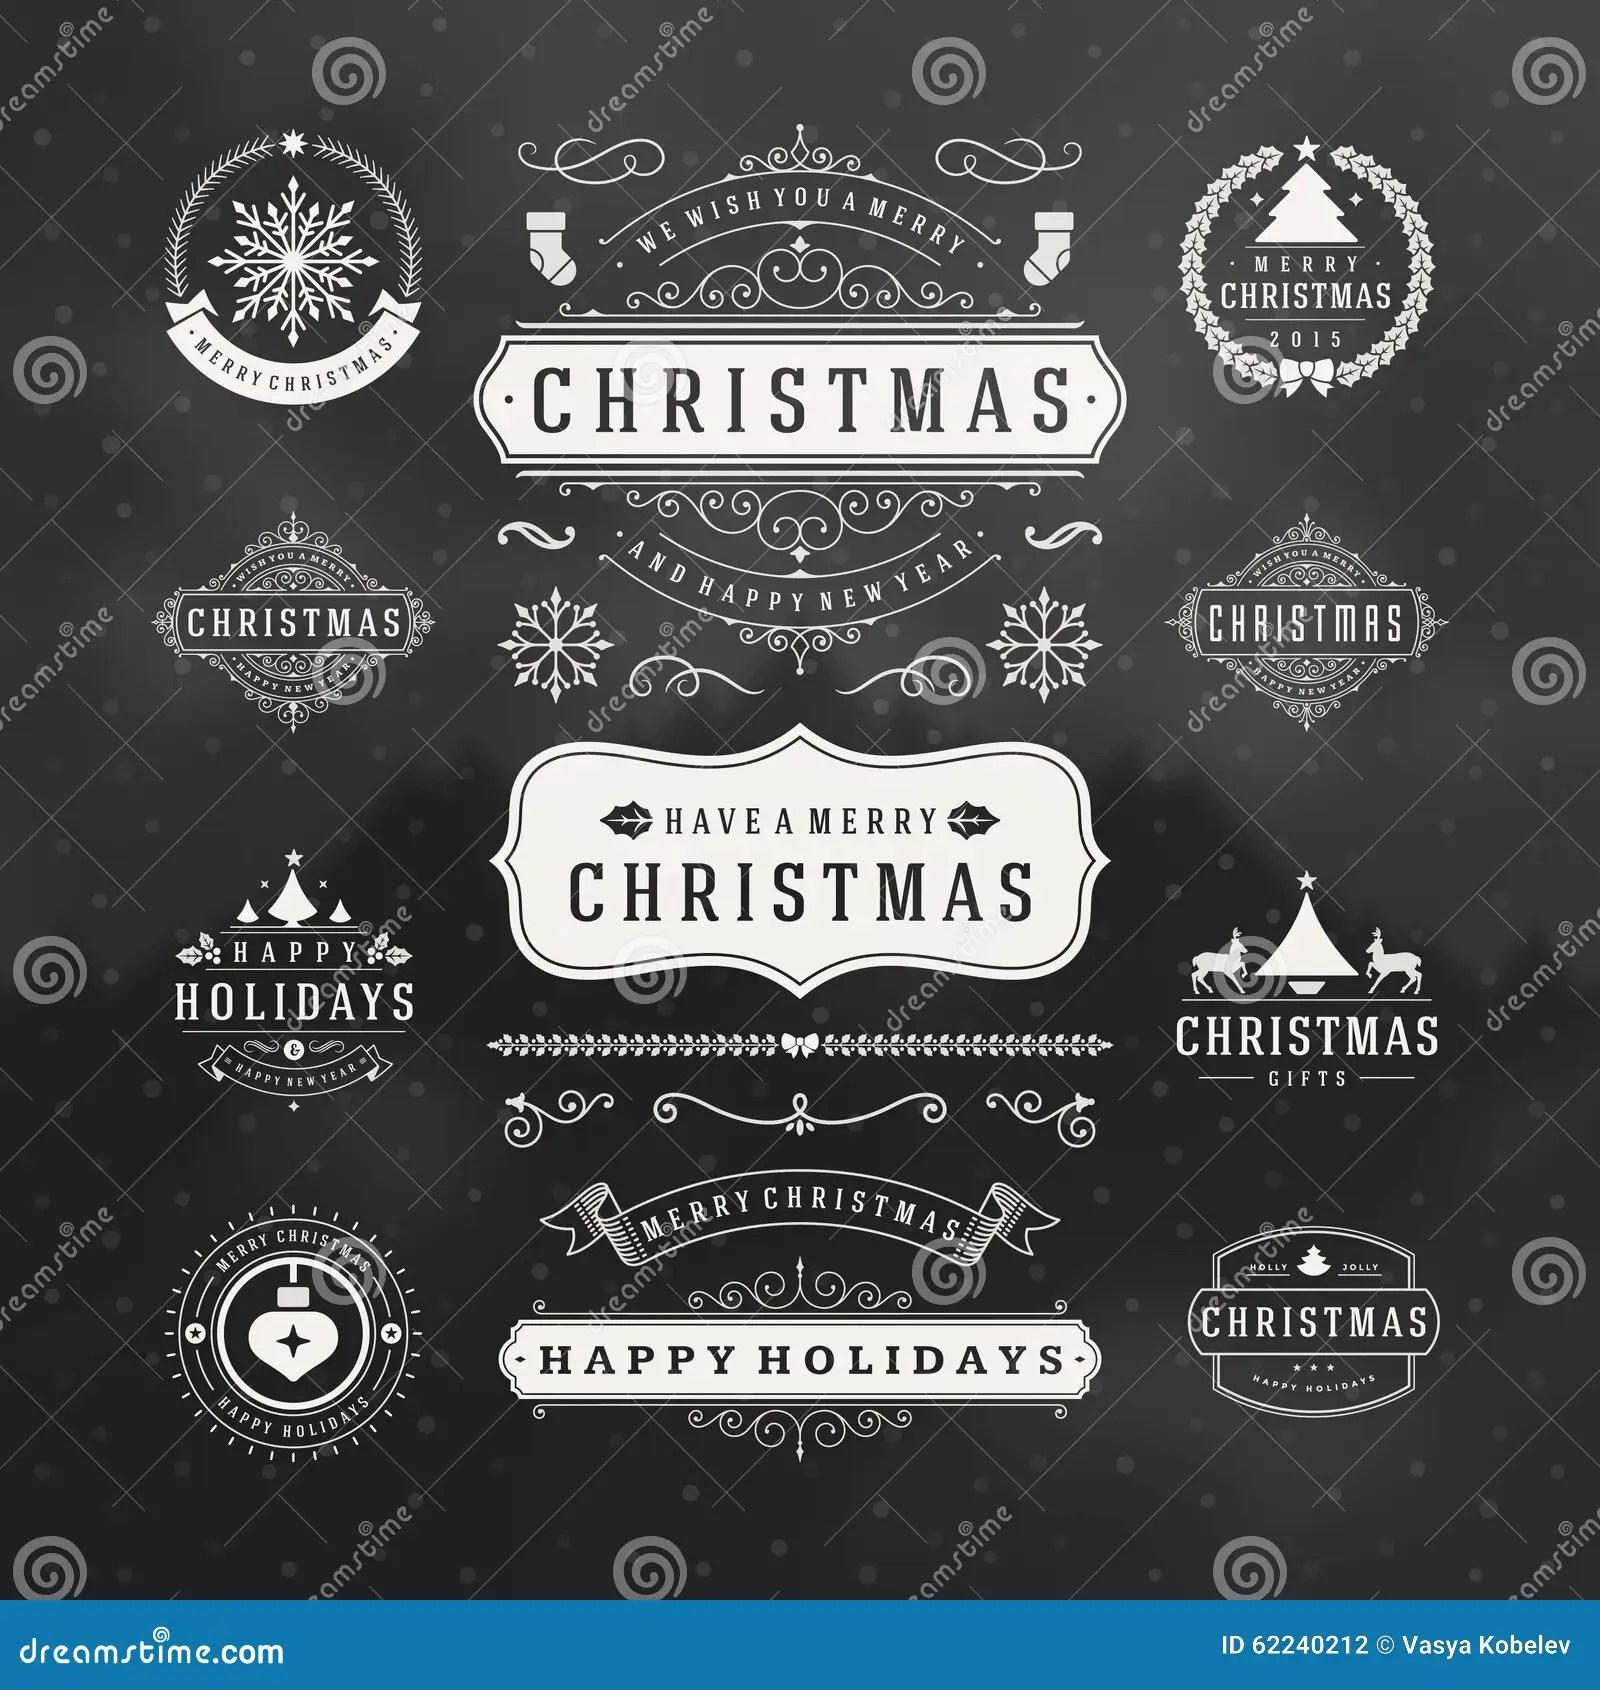 Christmas Decorations Vector Design Elements Stock Vector Illustration Of Celebration Merry 62240212